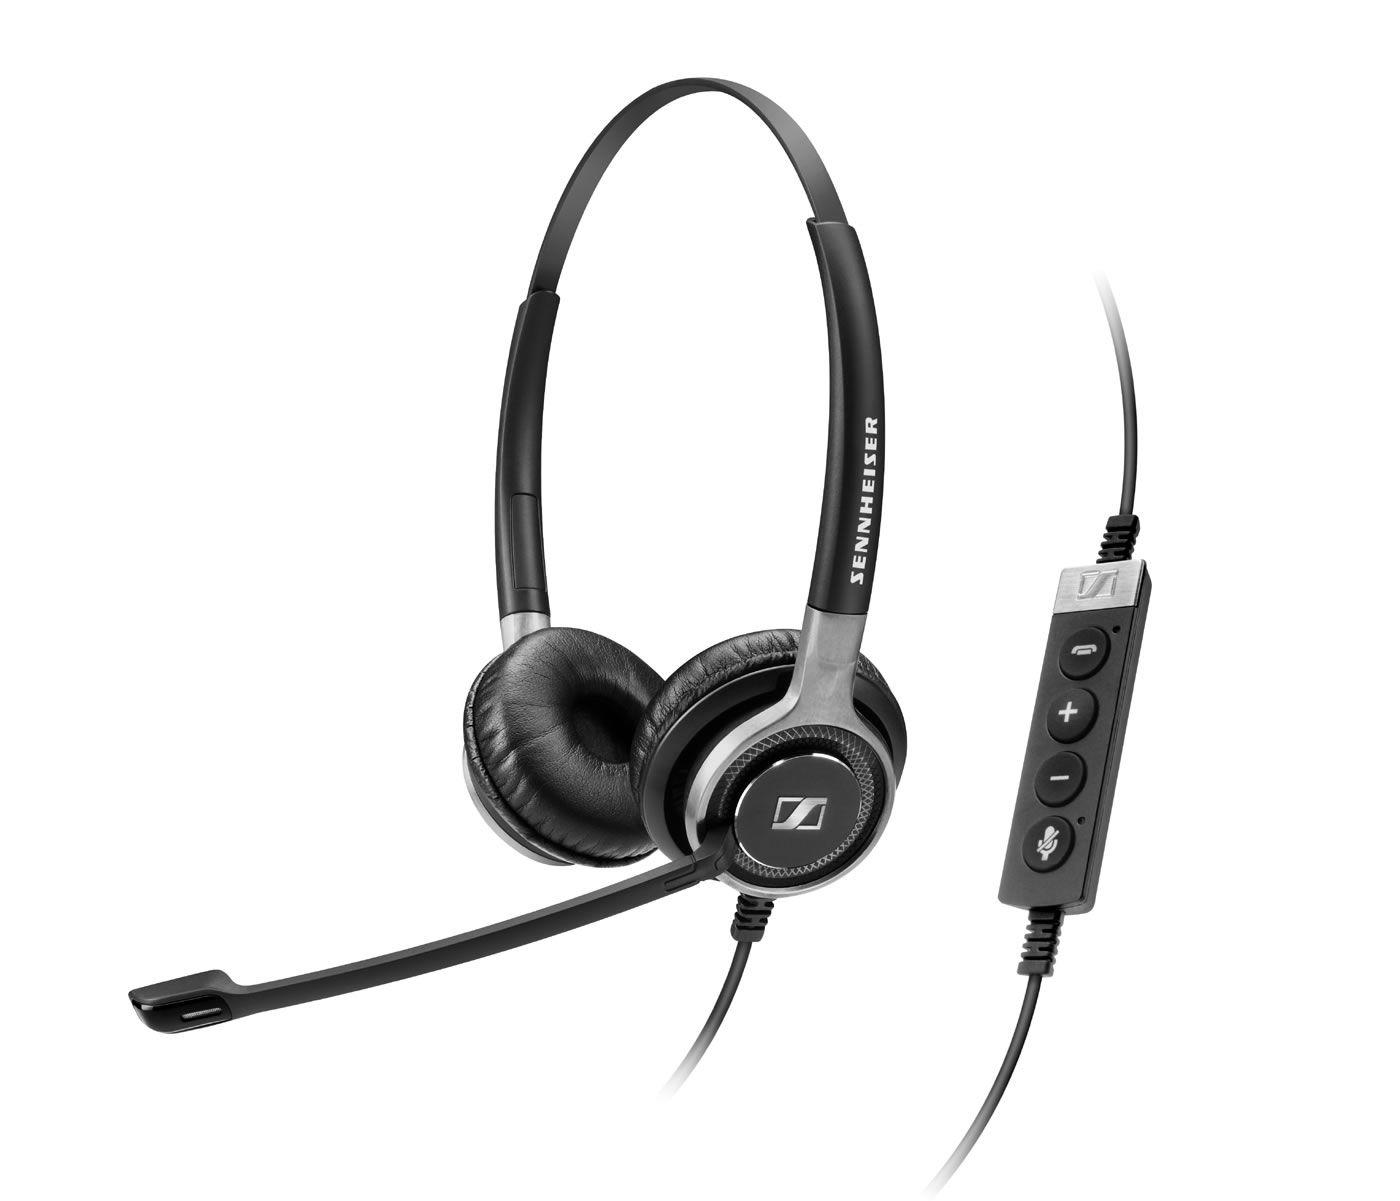 Image of Sennheiser SC 660 USB ML Duo Corded Headset for PC